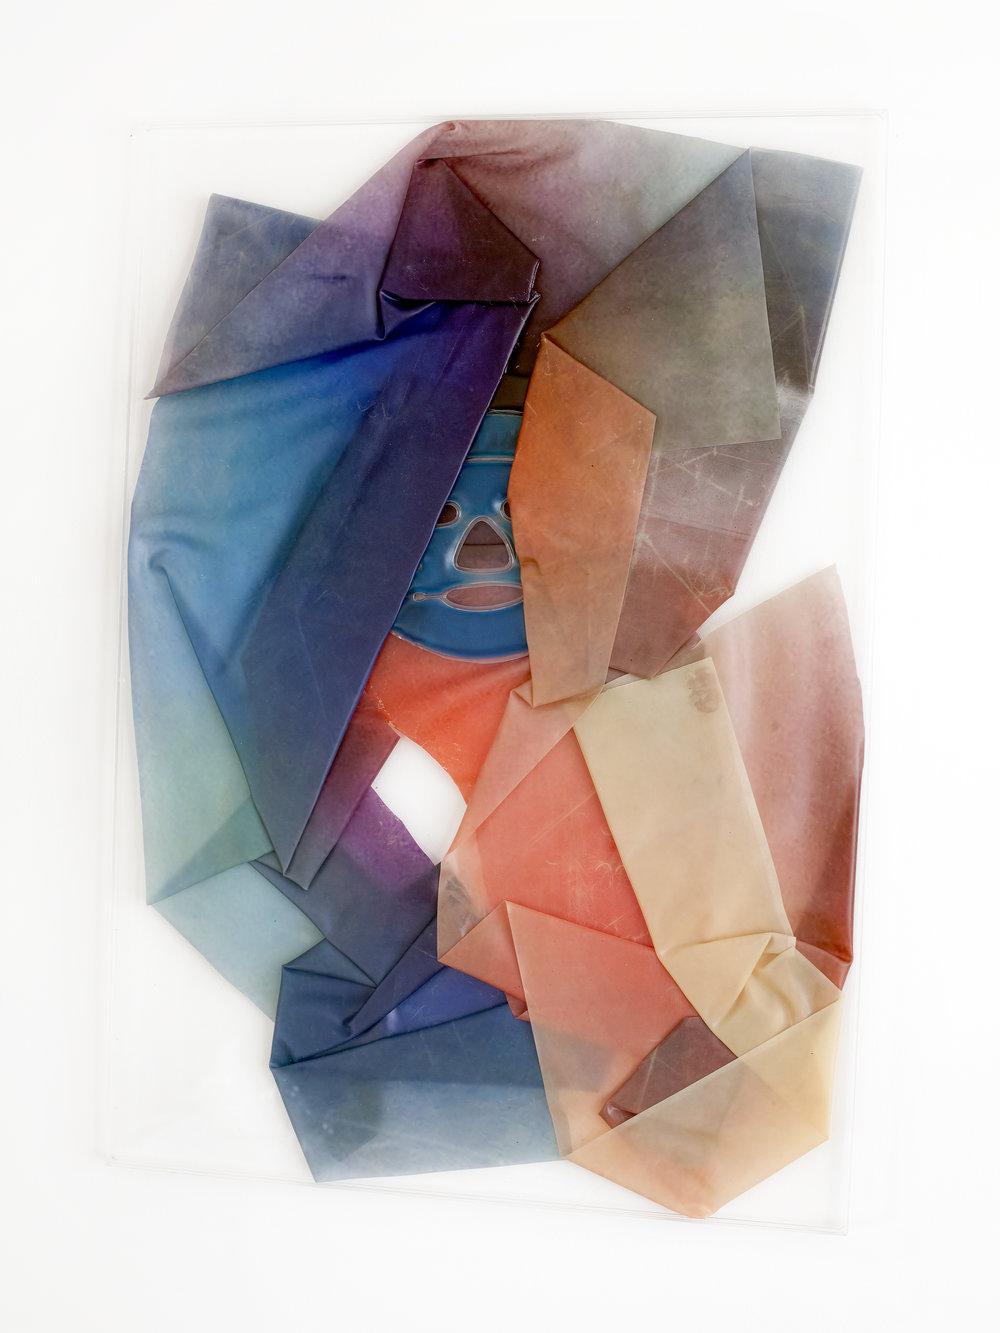 ZIPPED, 2018, sculpture (unique), 85 X 60 X 1,6 cm, inkjetprint on latex, transparent acrylic, face gel mask